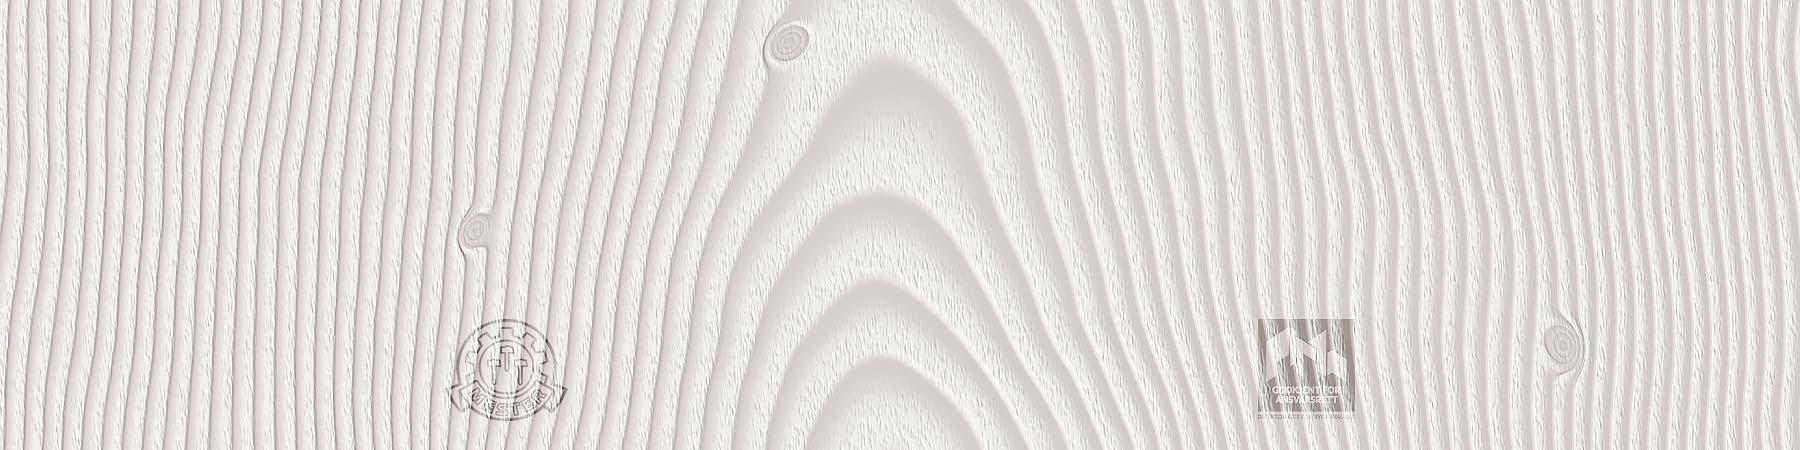 Bildespill_02a5-planke-fokus_1800x450px